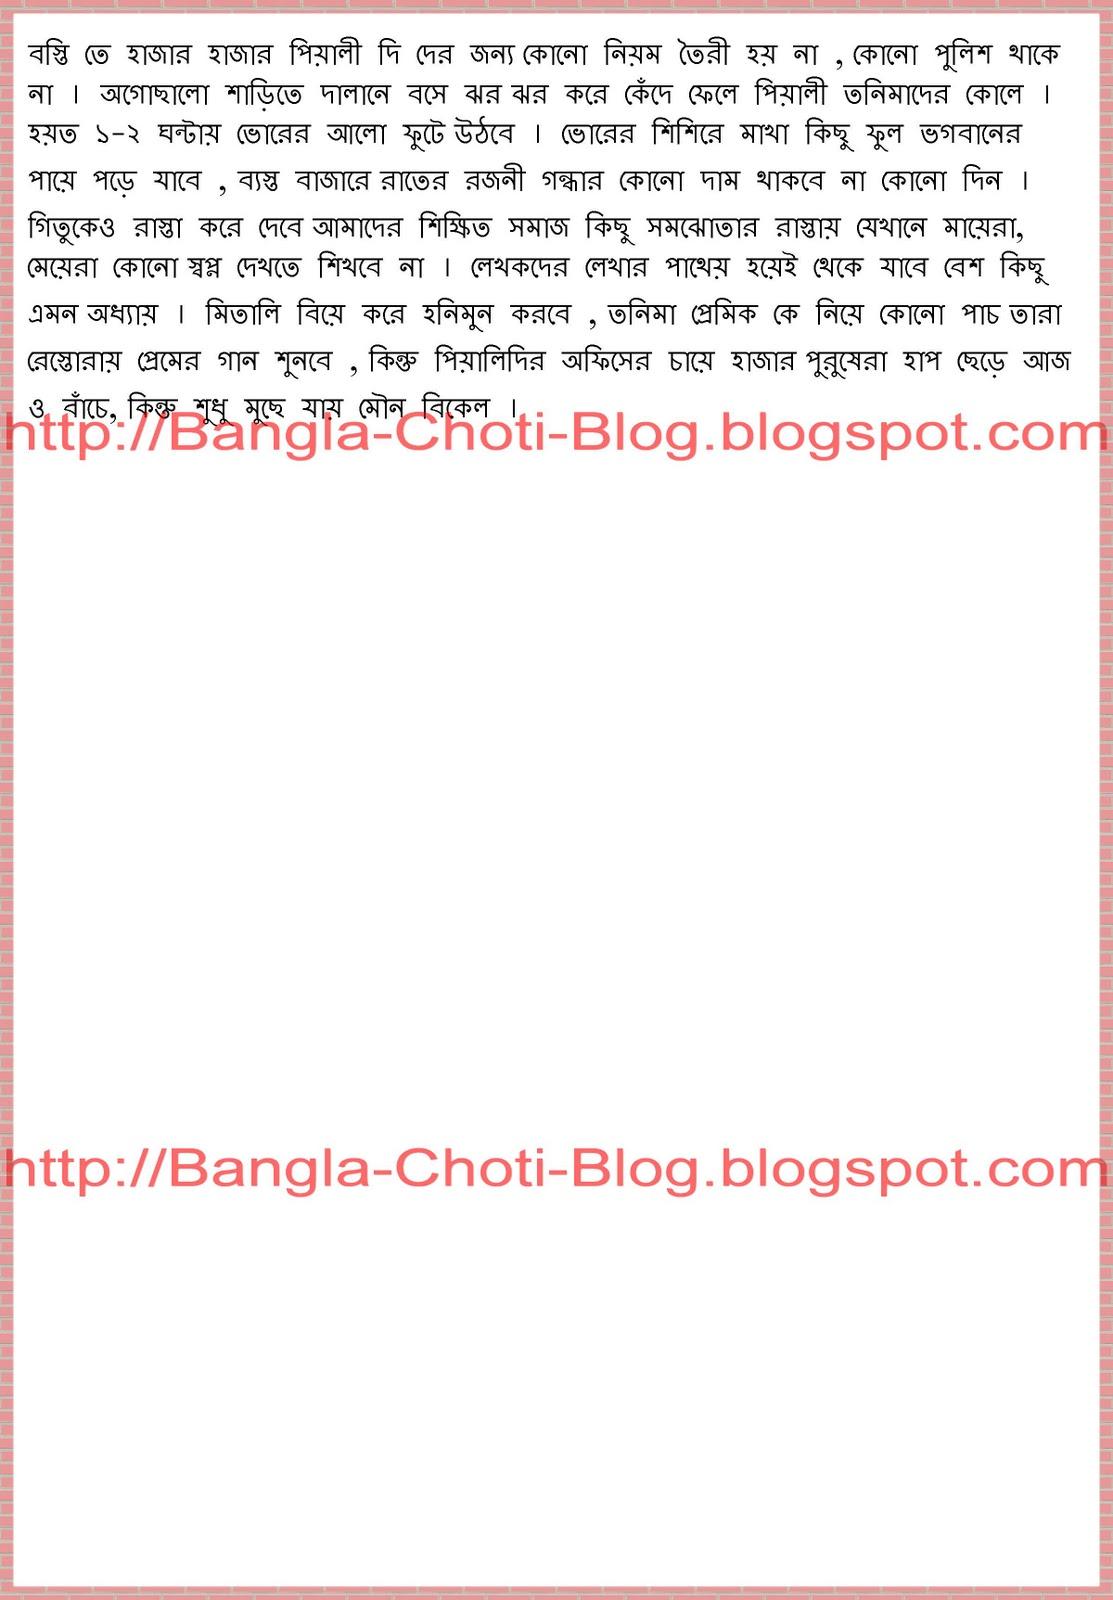 New Bangla Font Choti Golpo Download 2012  Bangladeshi -2863